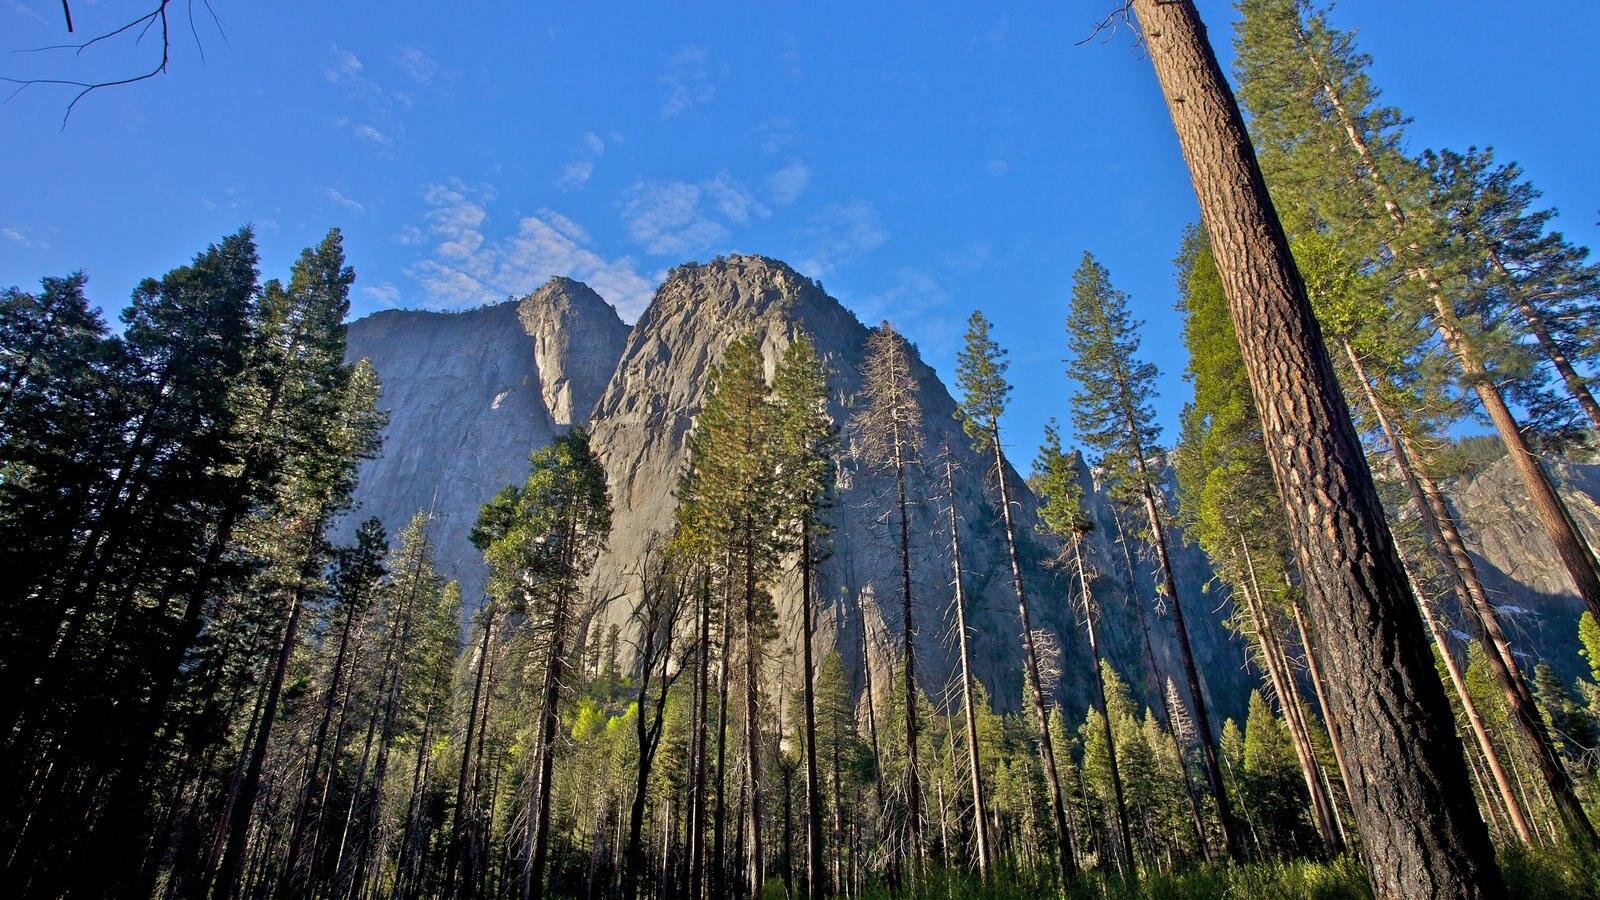 Parque Nacional Yosemite mostrando bosques